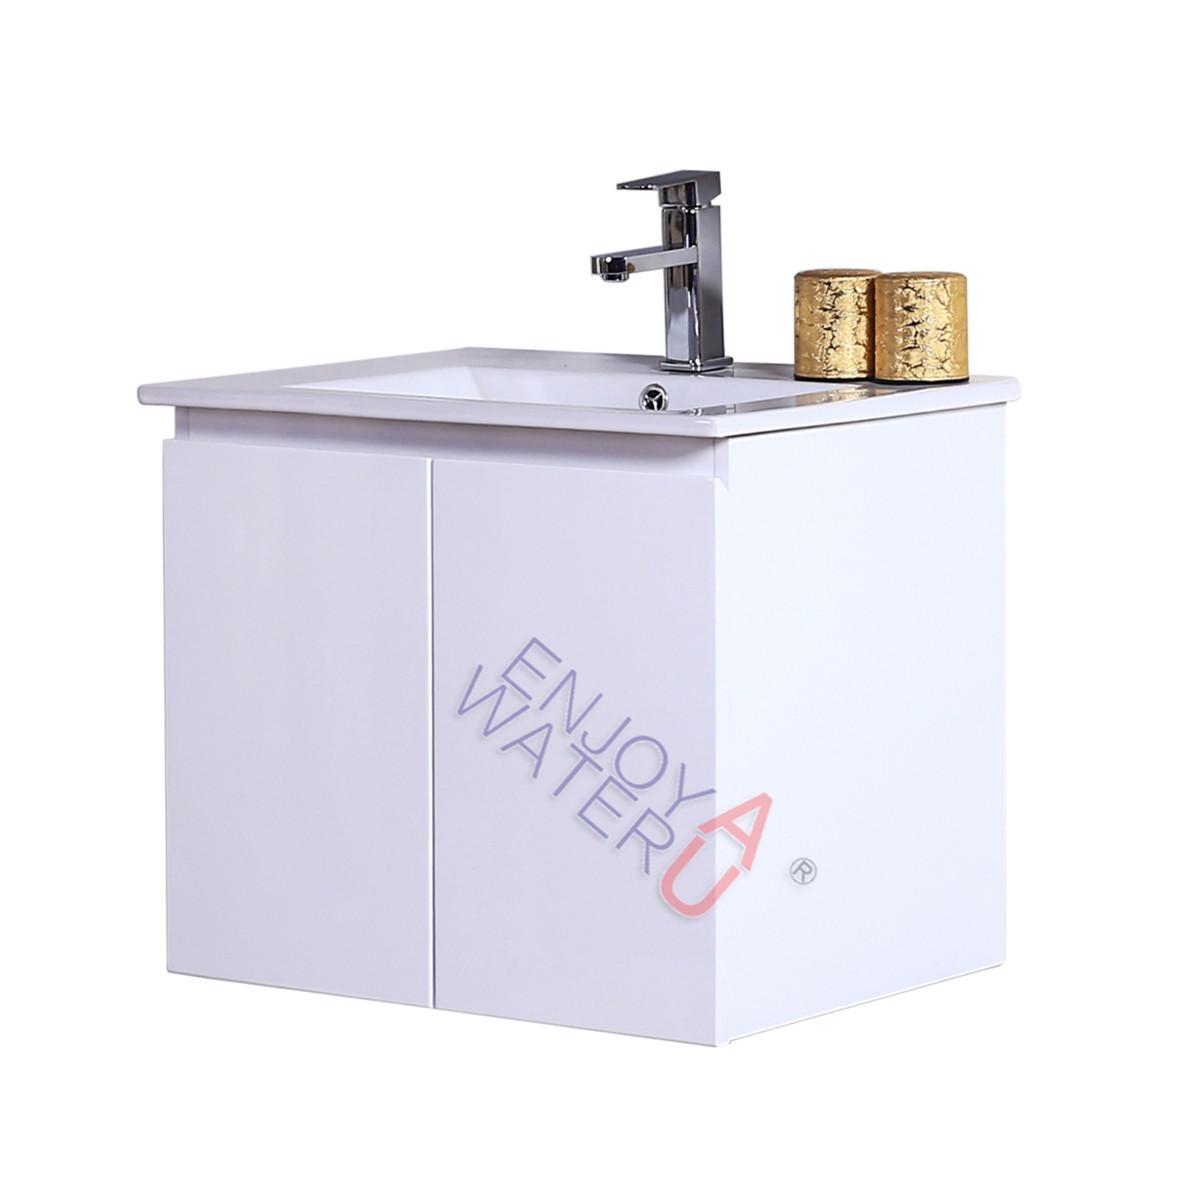 610mm Wall Hung Bathroom Vanity Cabinet Ceramic Basin